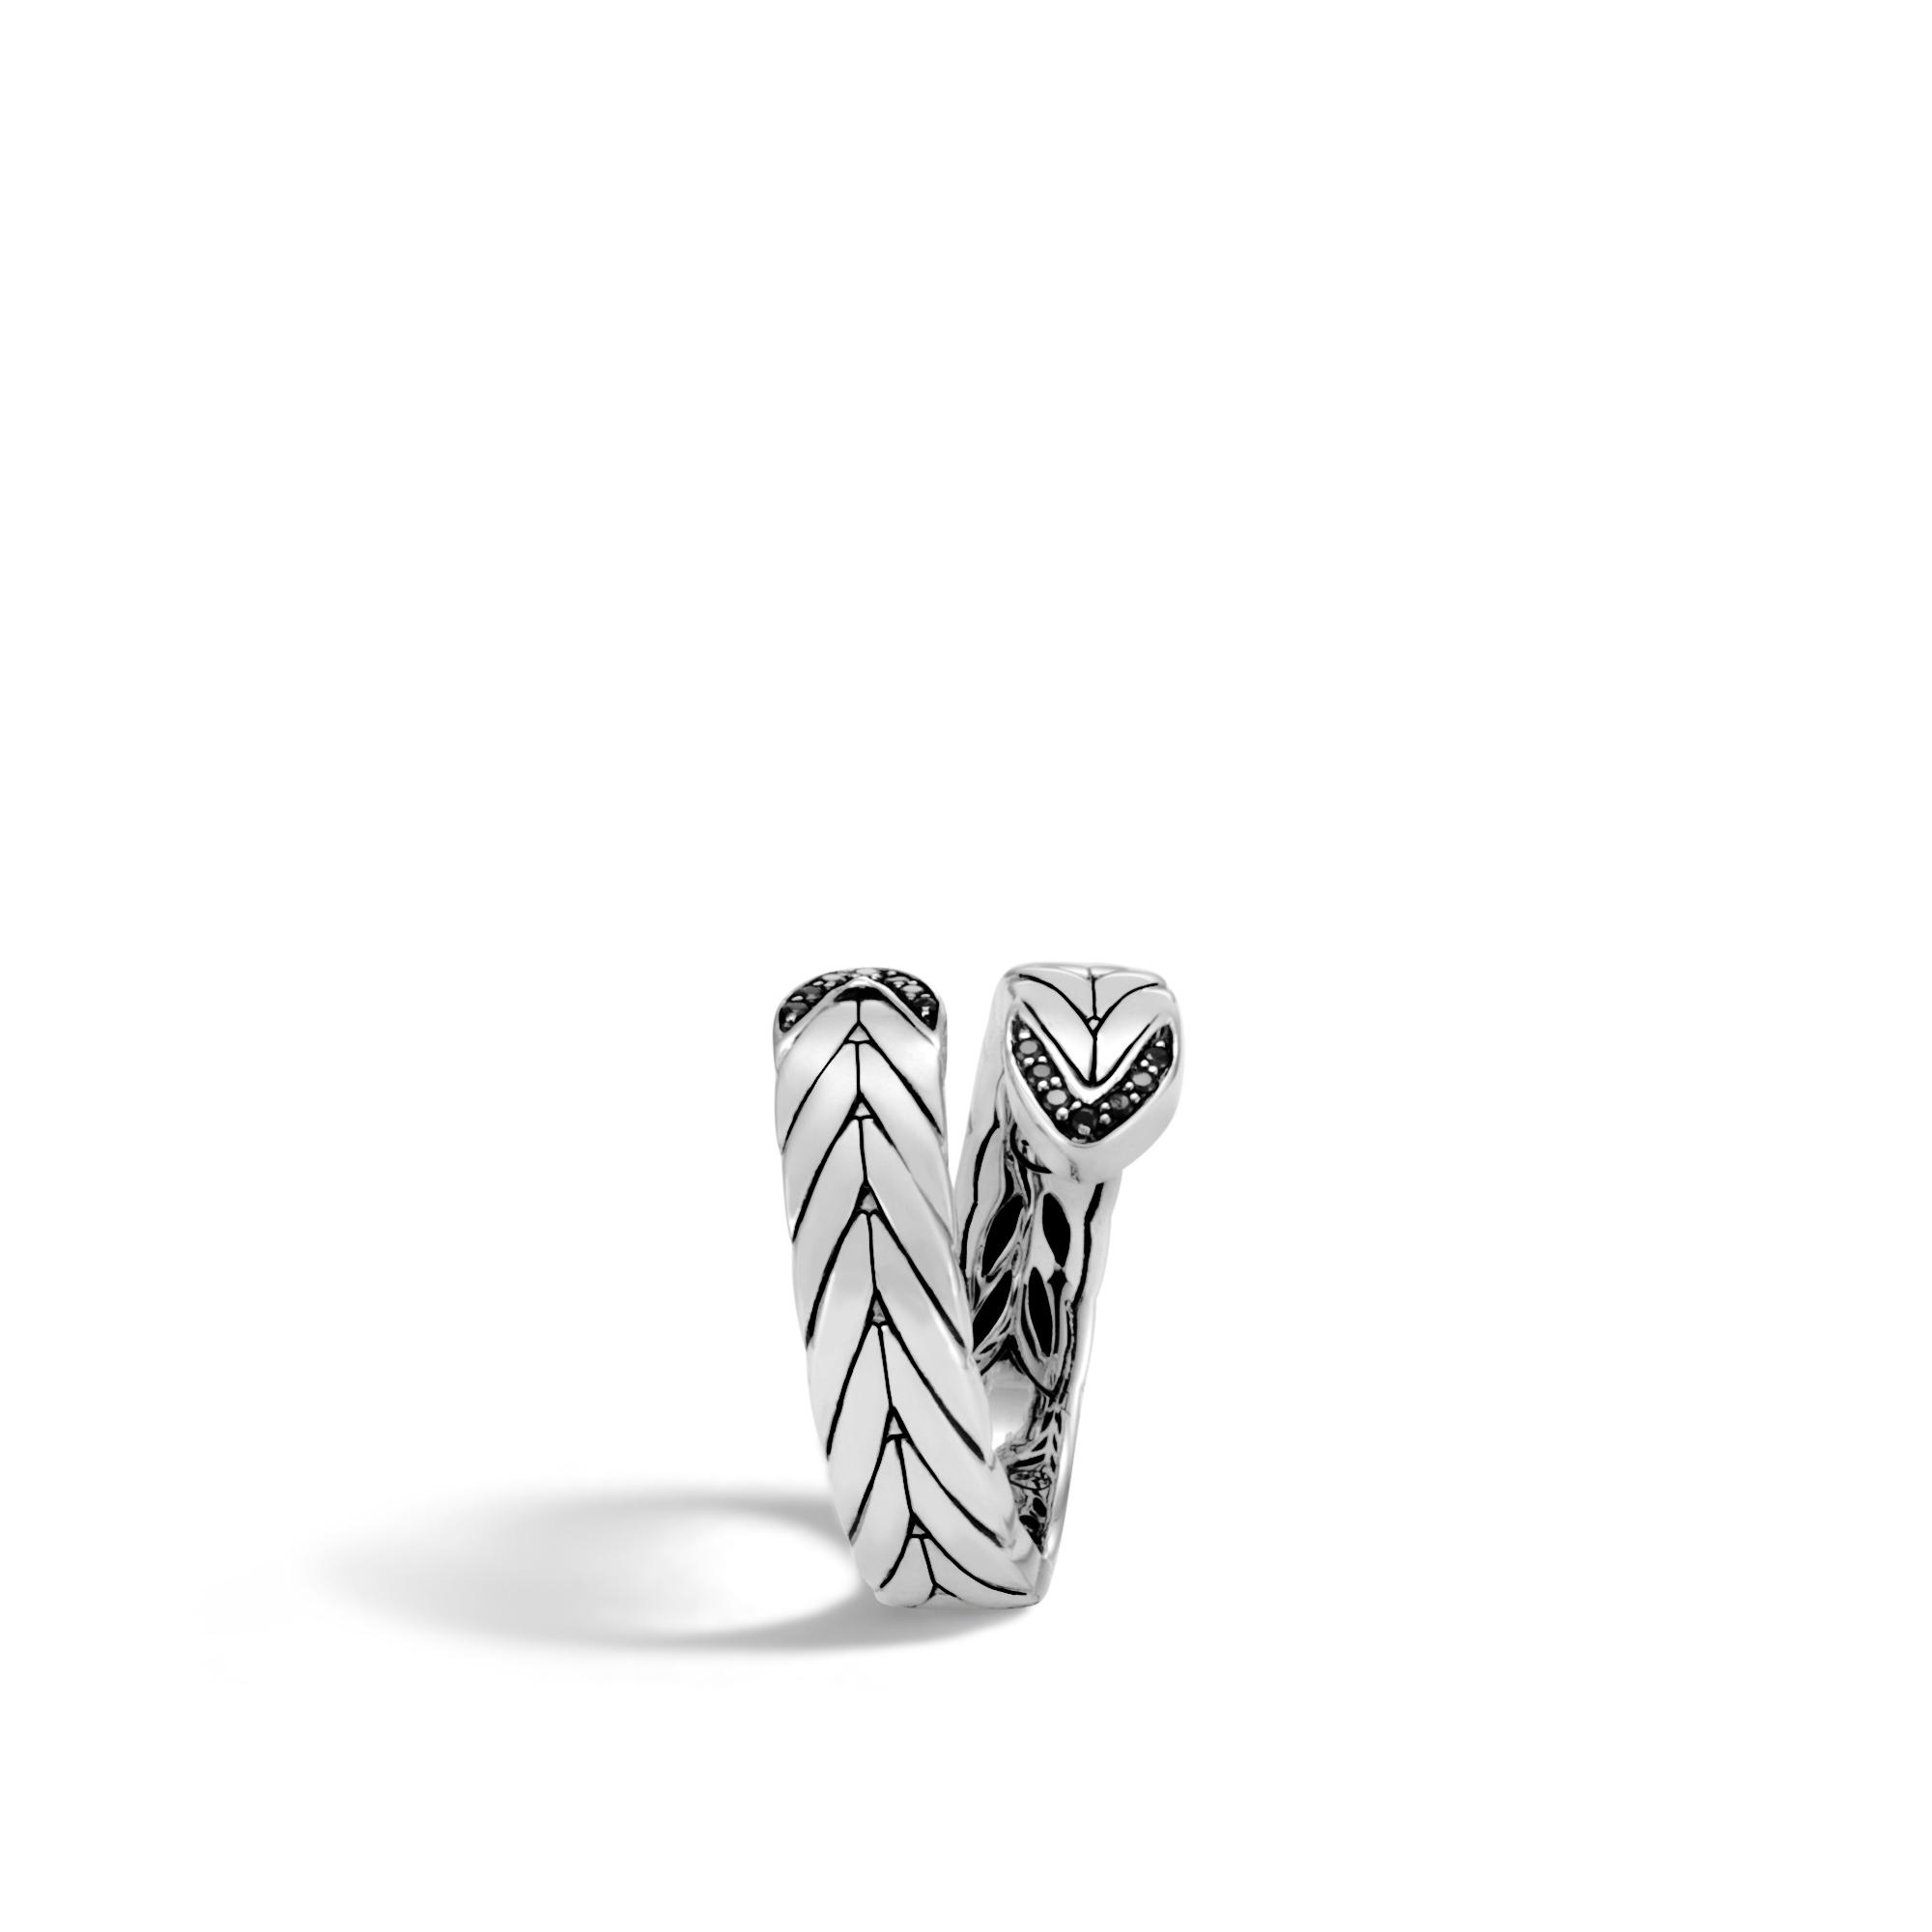 John Hardy Modern Chain Bypass Ring With Black Spinel E264Ao3v